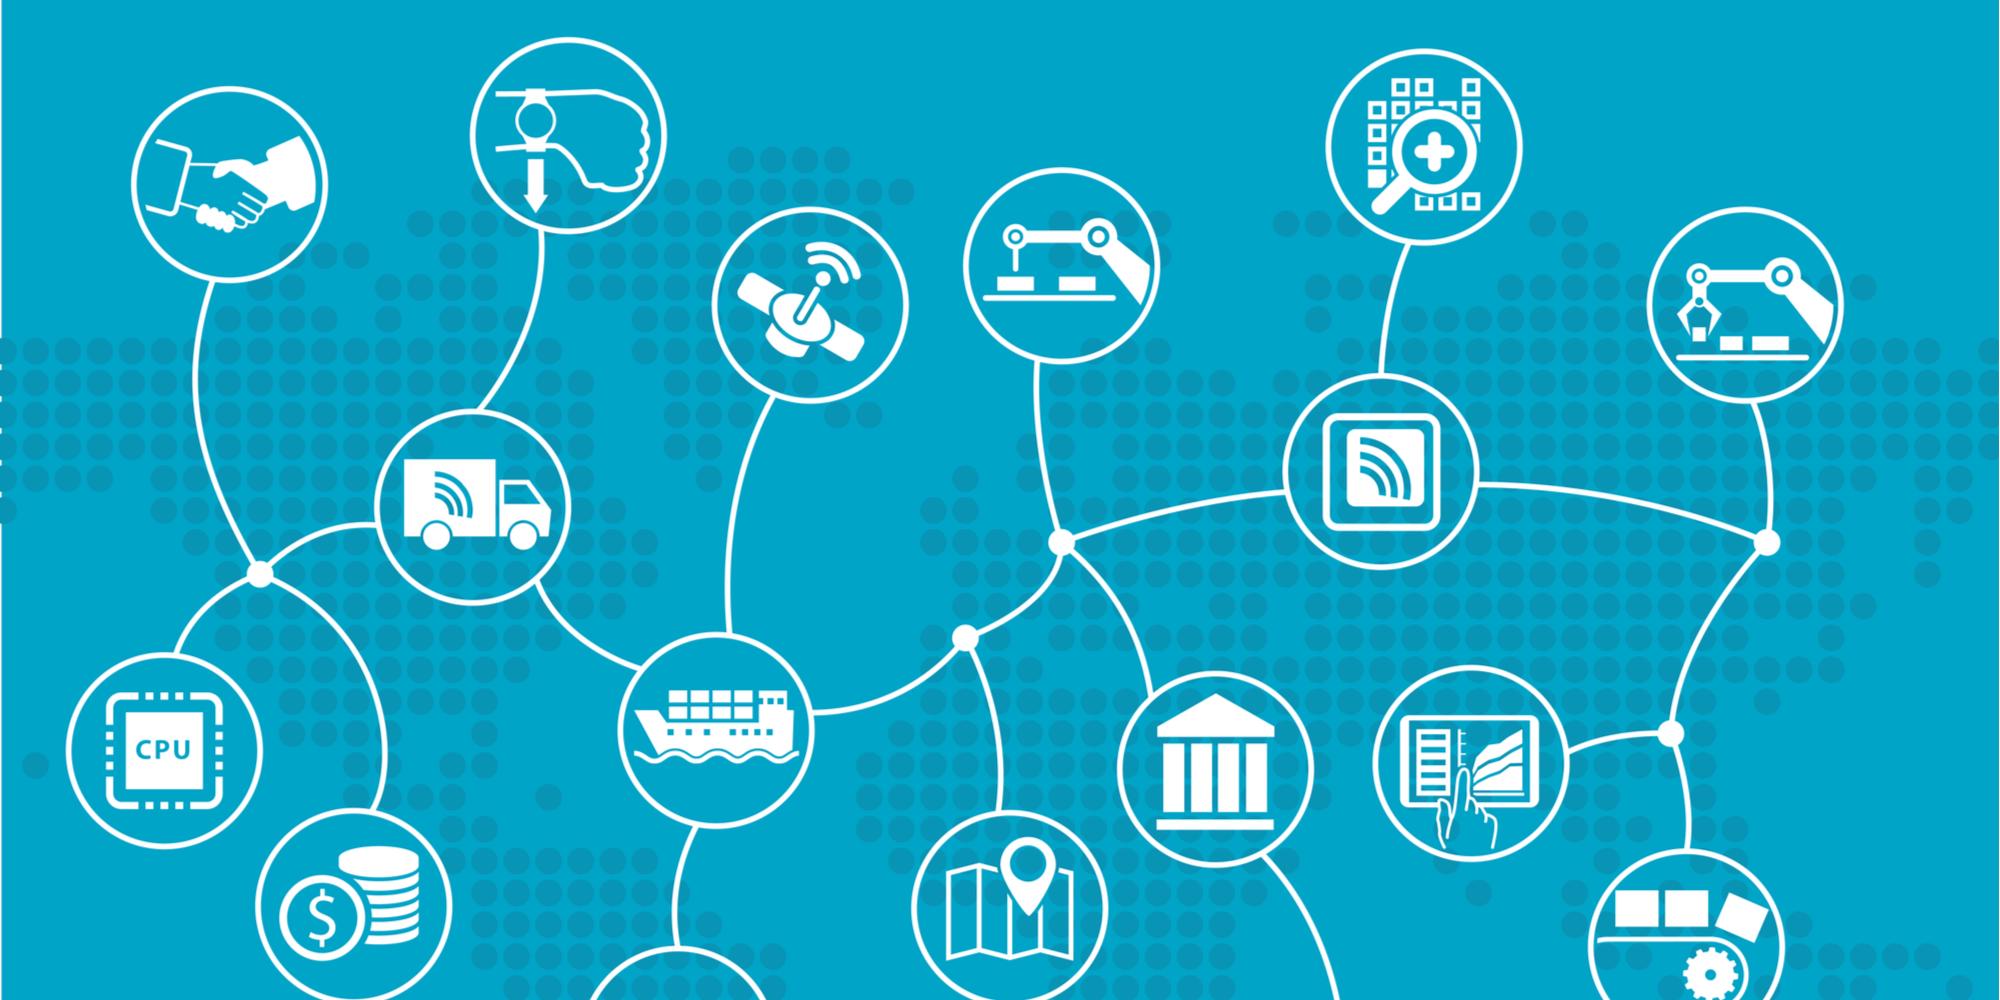 LORCA member Orpheus develops new cybersecurity feature for an NHS procurement platform